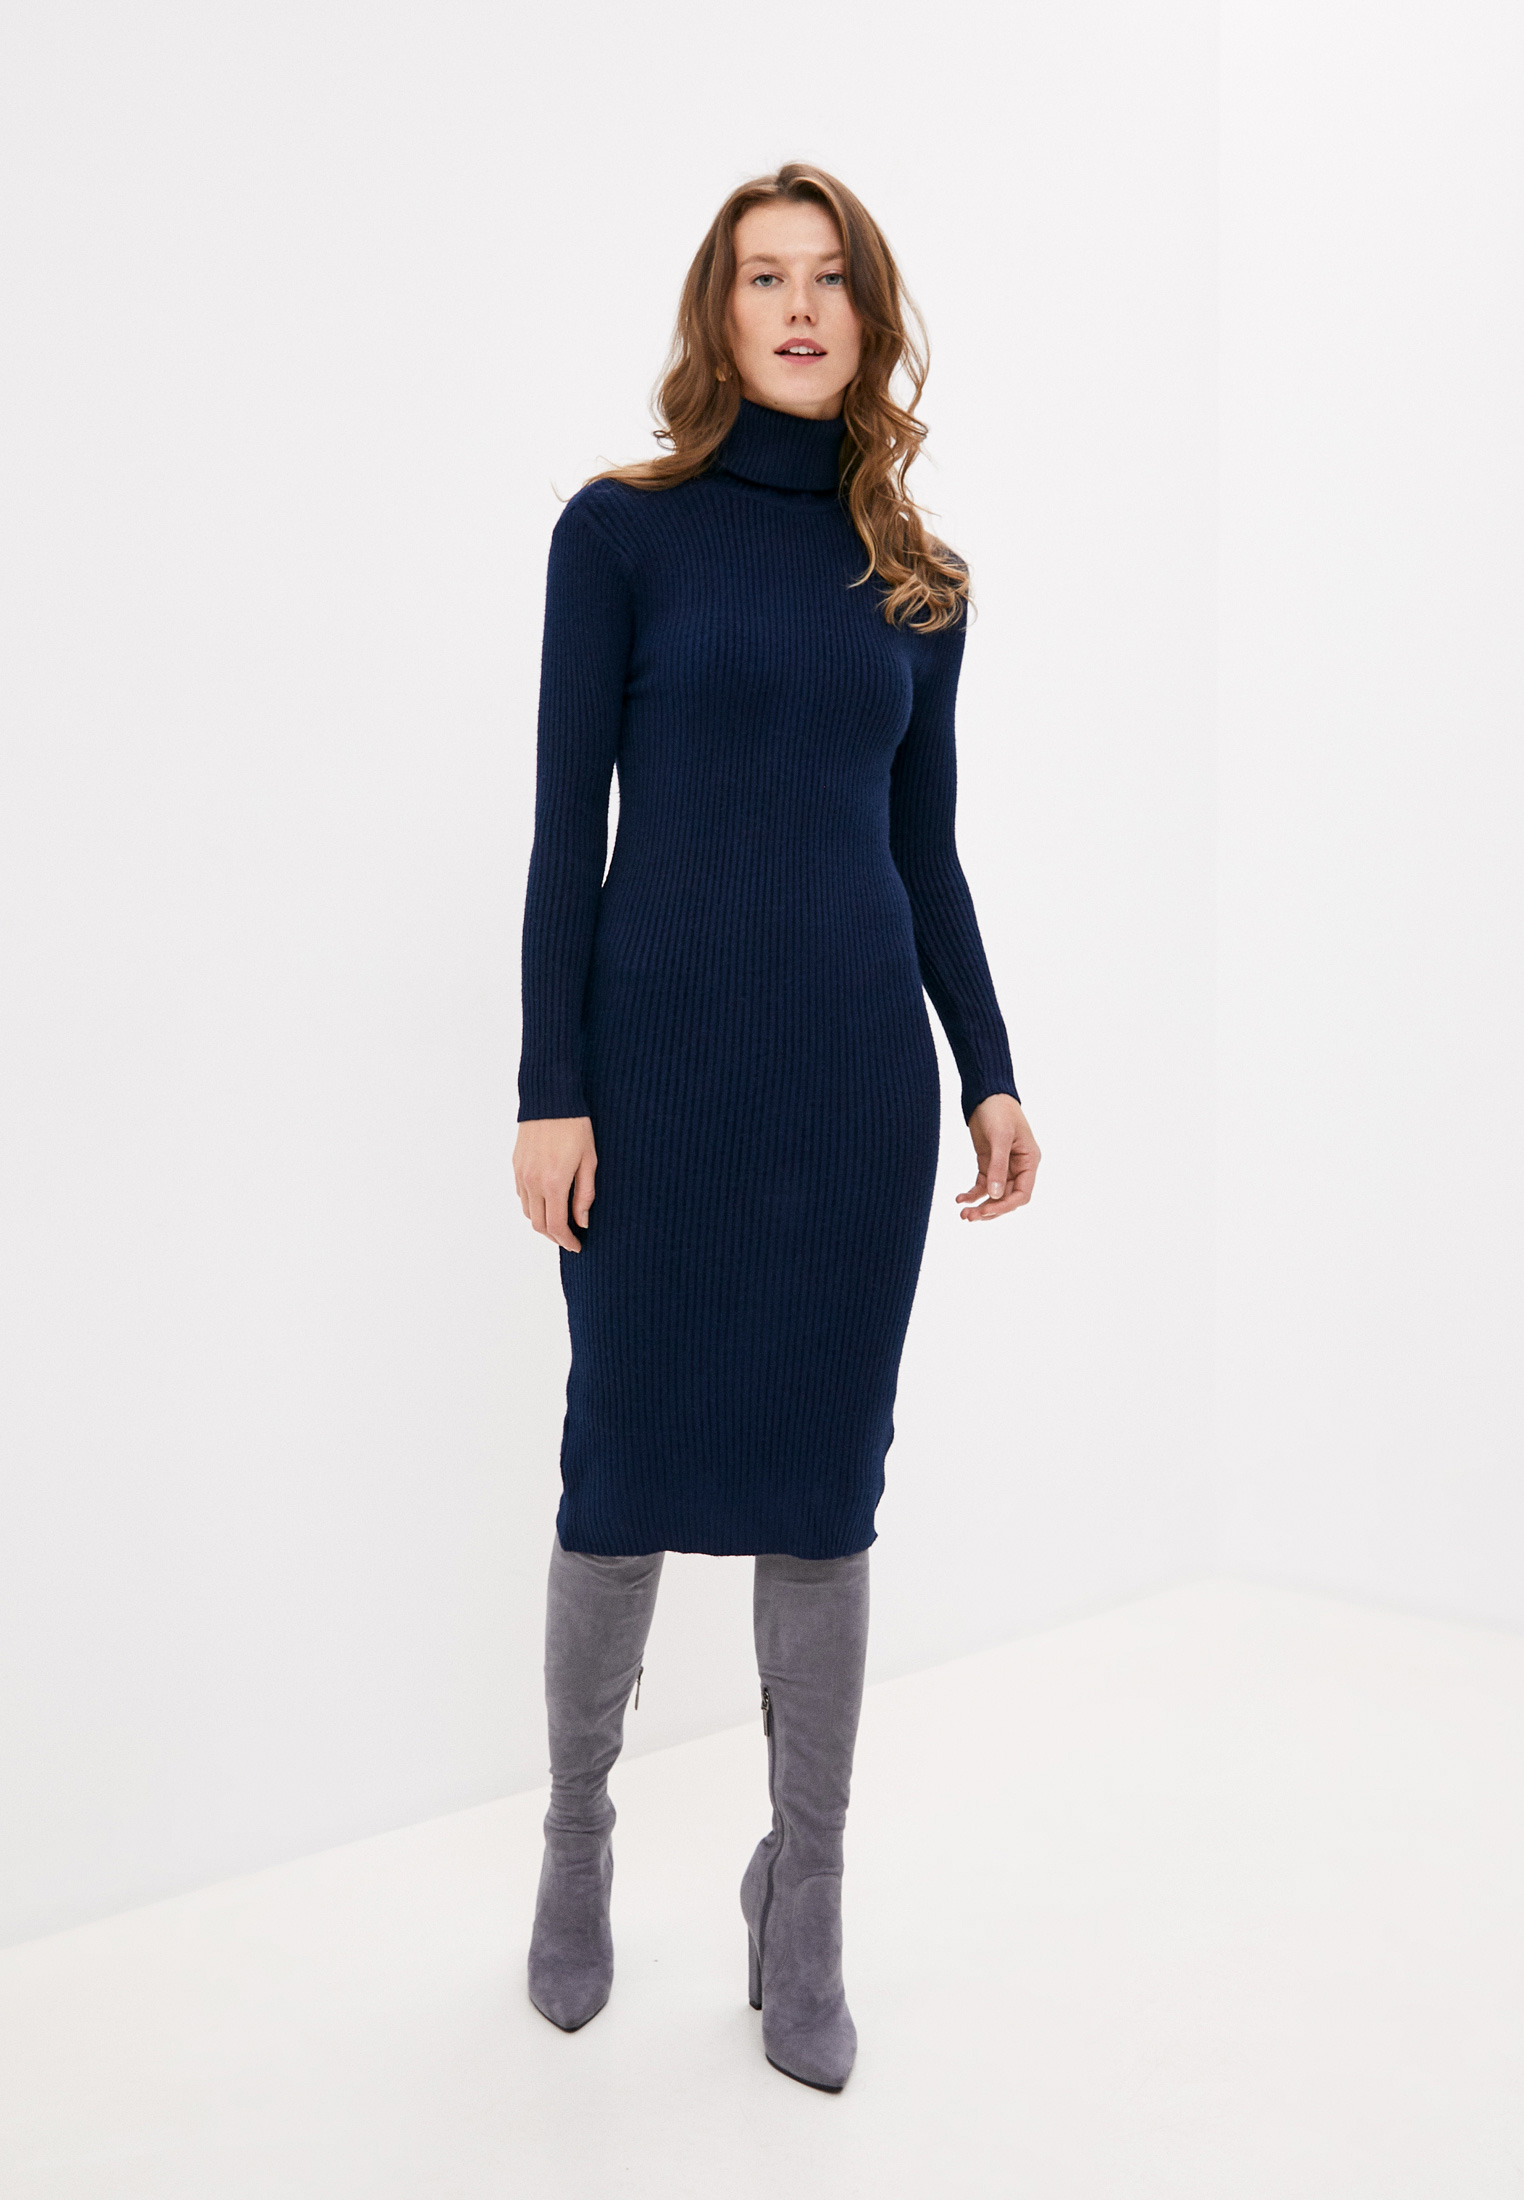 Вязаное платье Nerouge N978-13